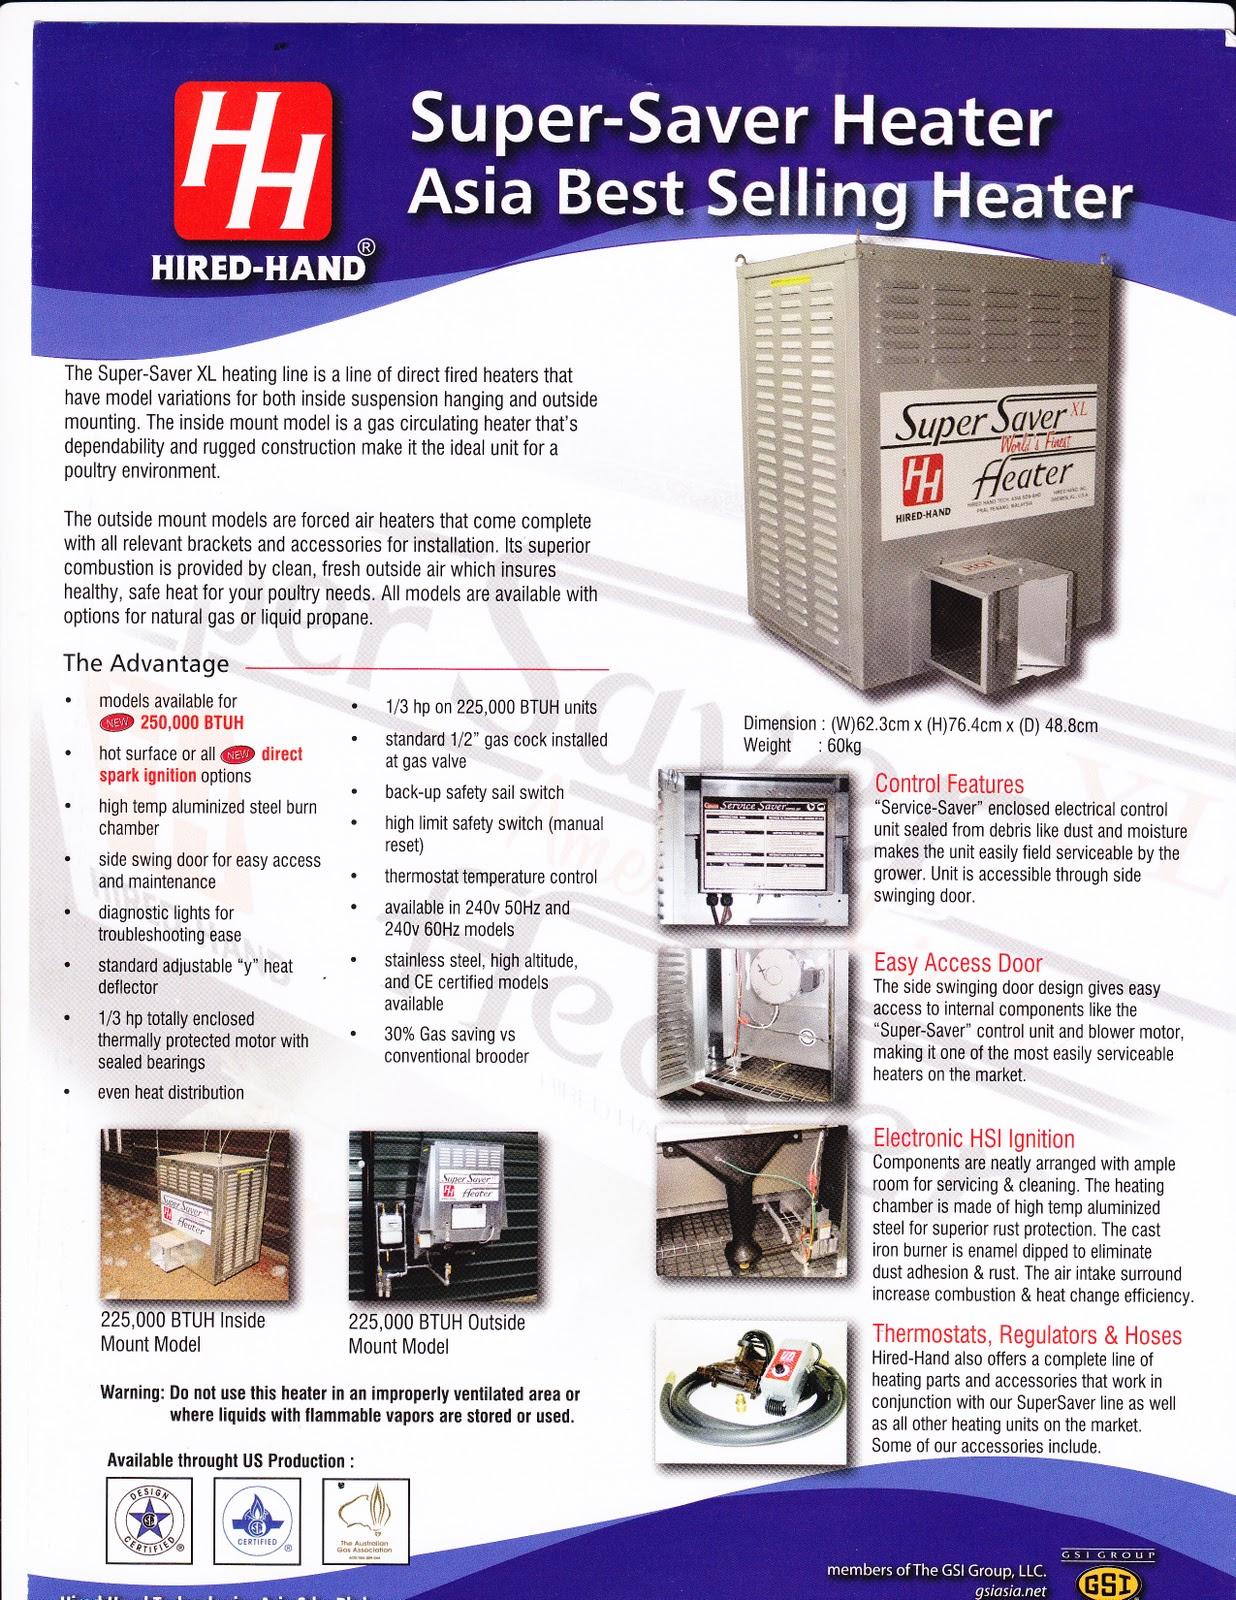 Pemanas Listrik Super Saver Heater Pusat Ternak Indonesia